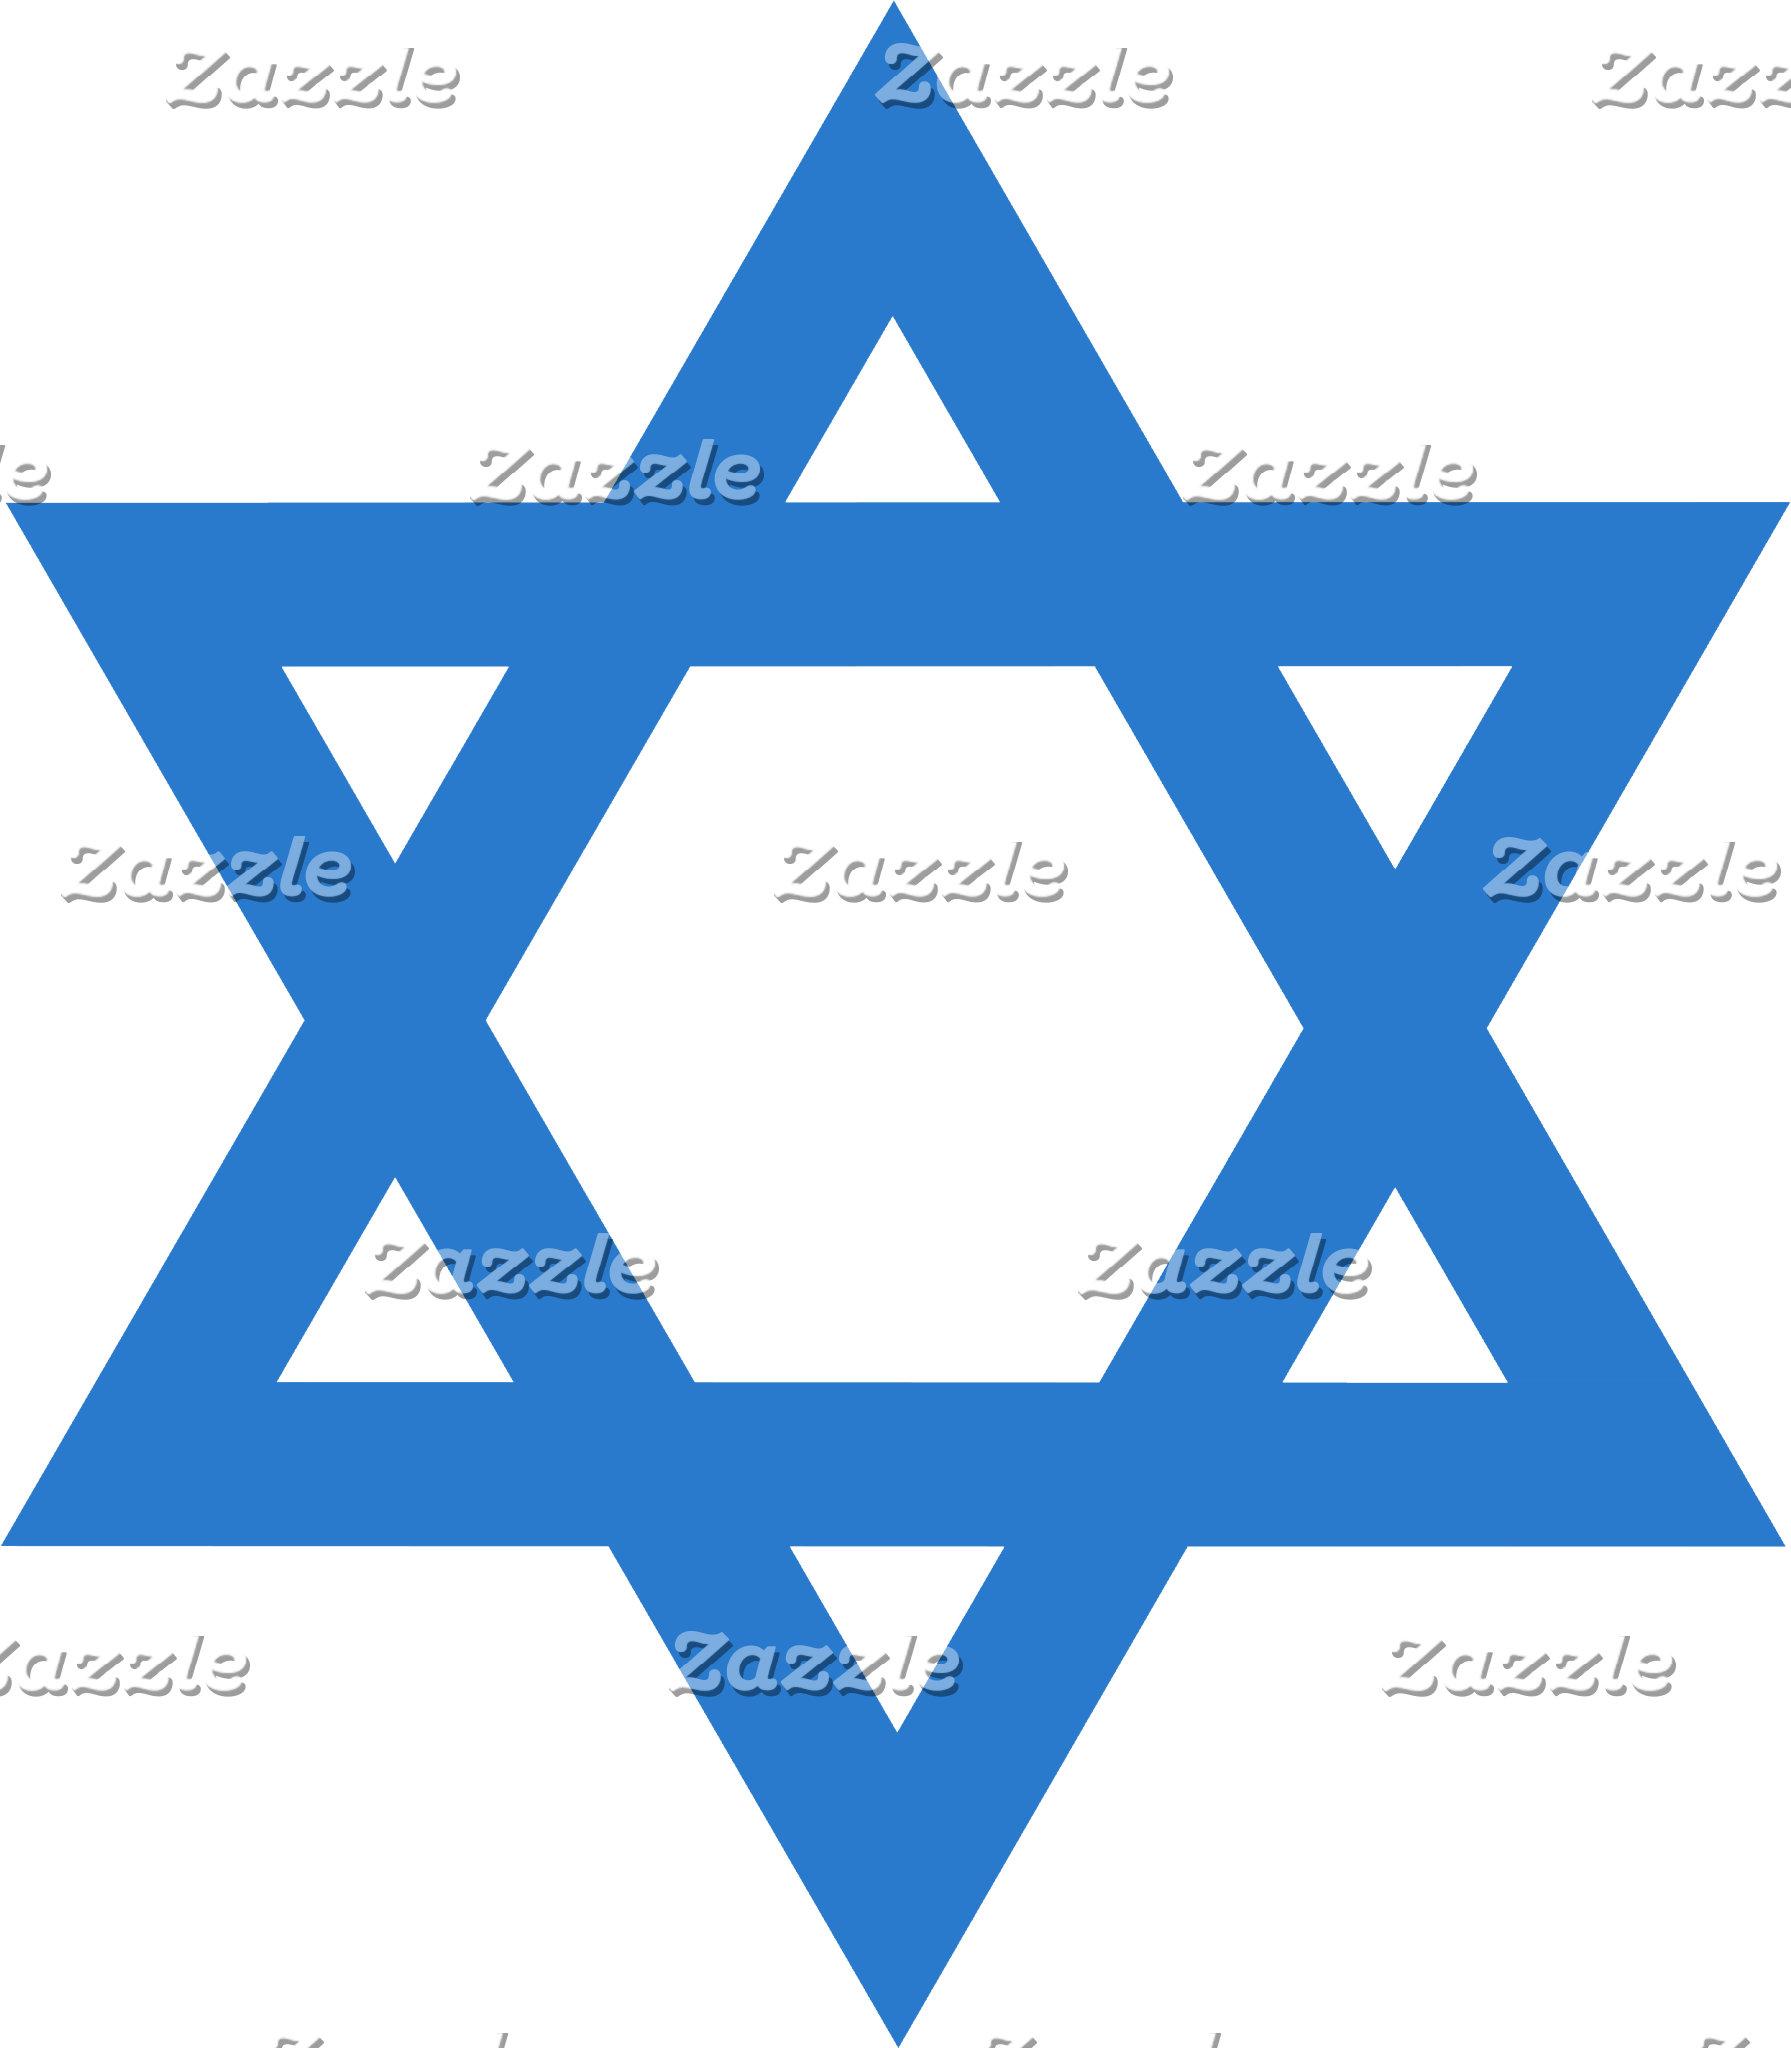 Israel and Judaism